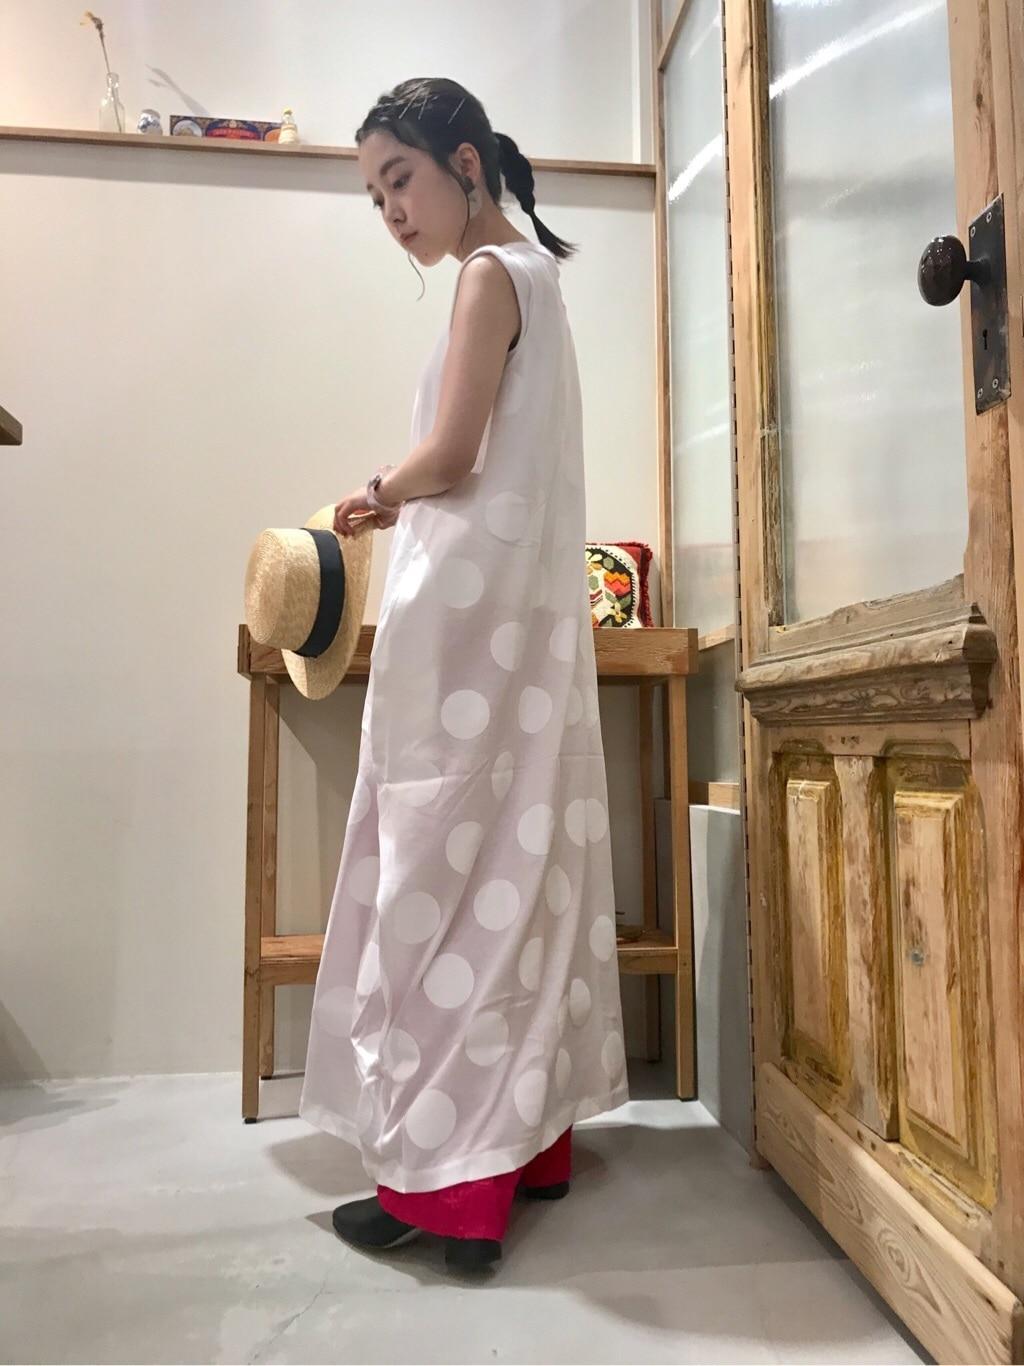 bulle de savon 渋谷スクランブルスクエア 身長:153cm 2020.07.09